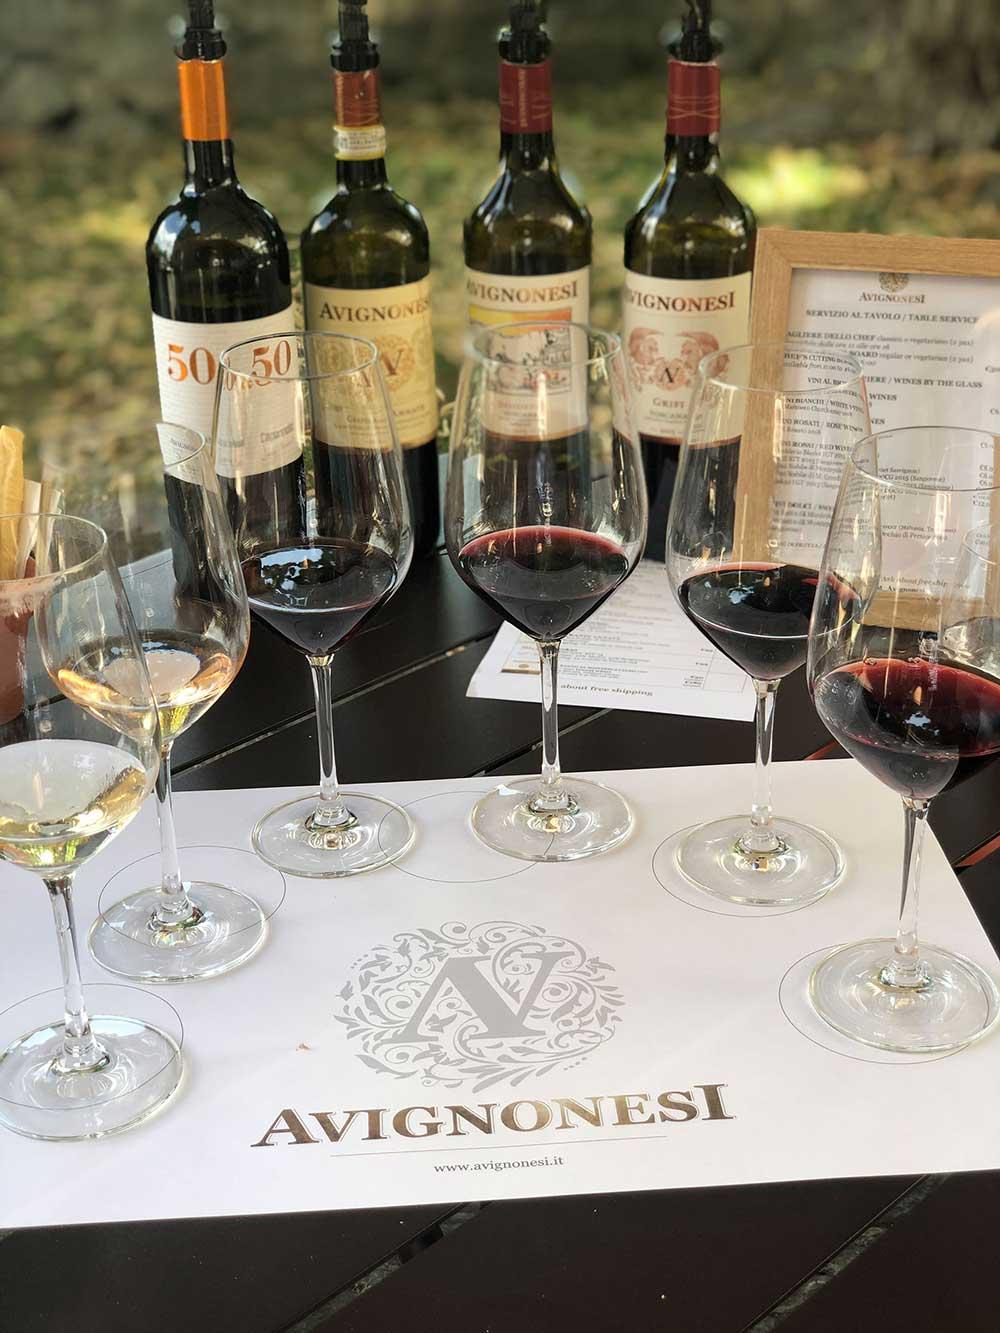 Wine tasting flight Avignonesi Winery Montepulciano Italy